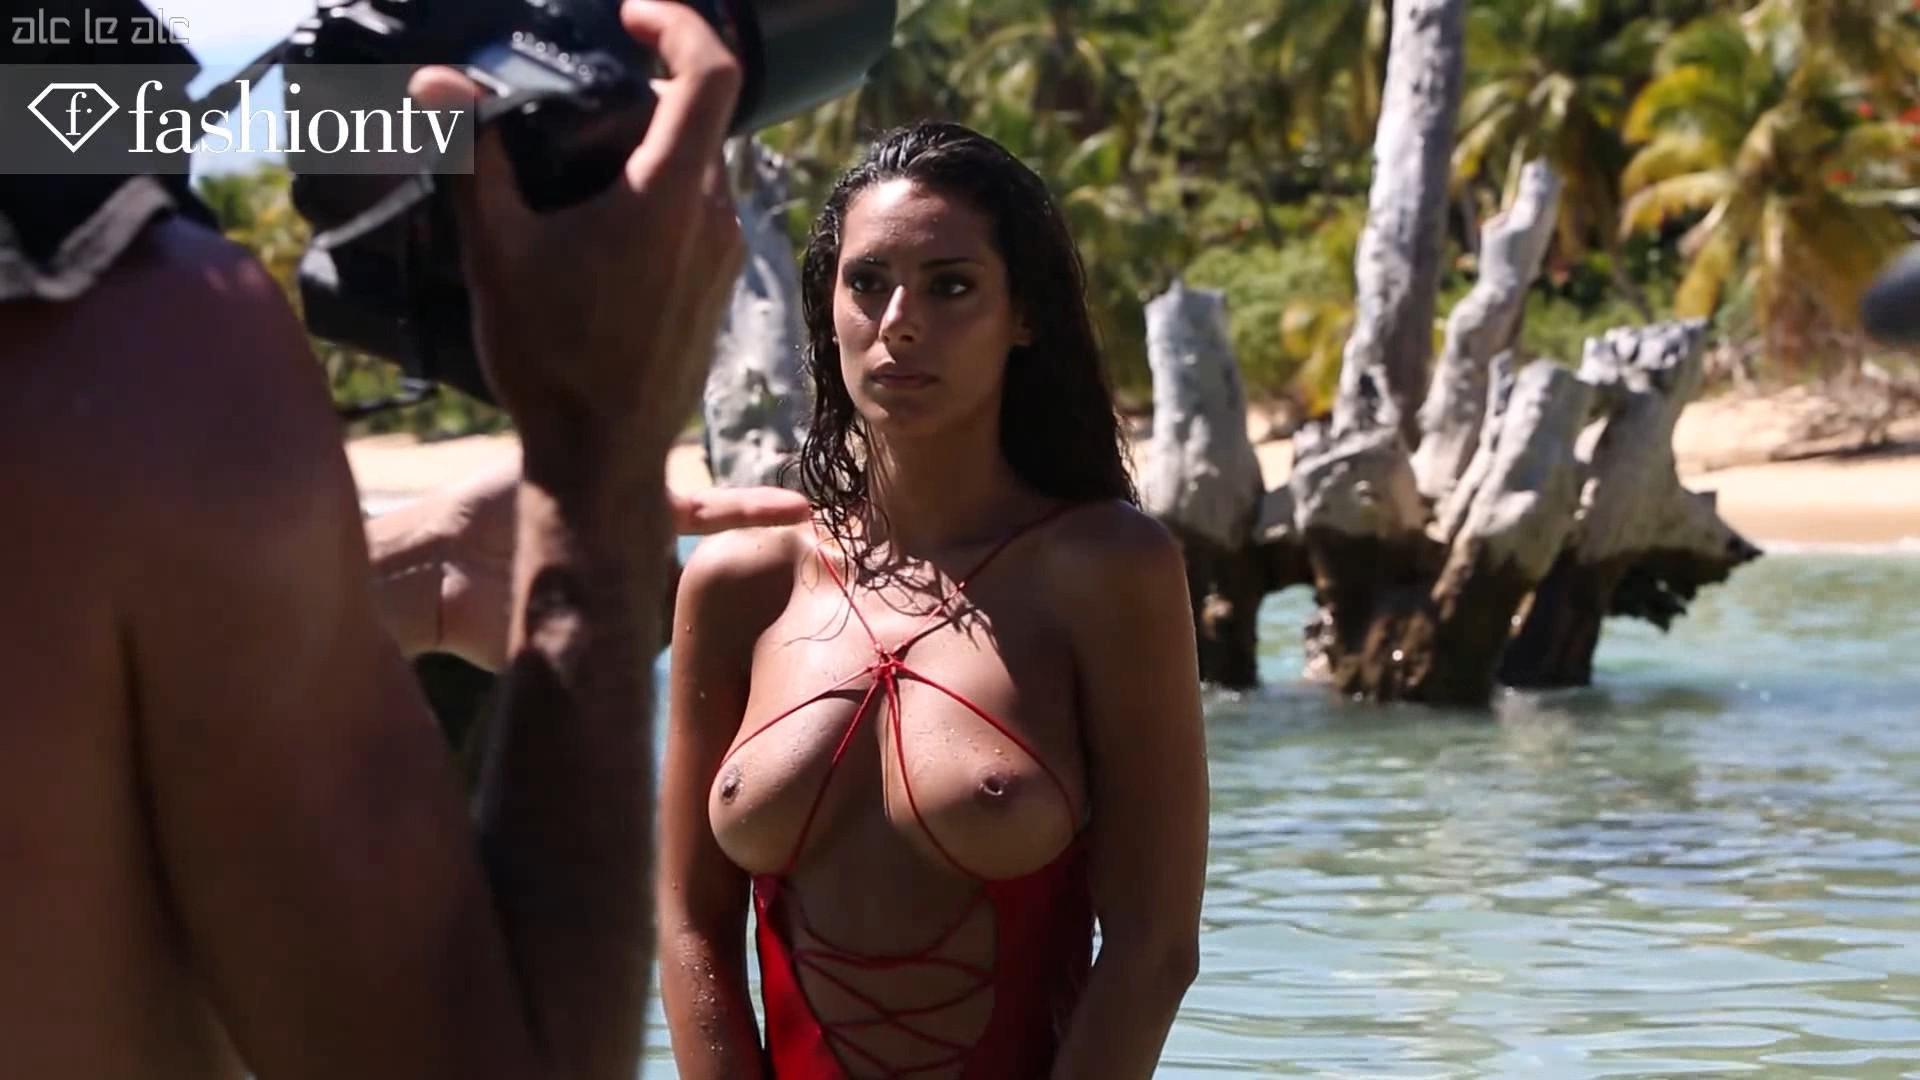 Raffaella modugno topless 7 Photos - 2019 year